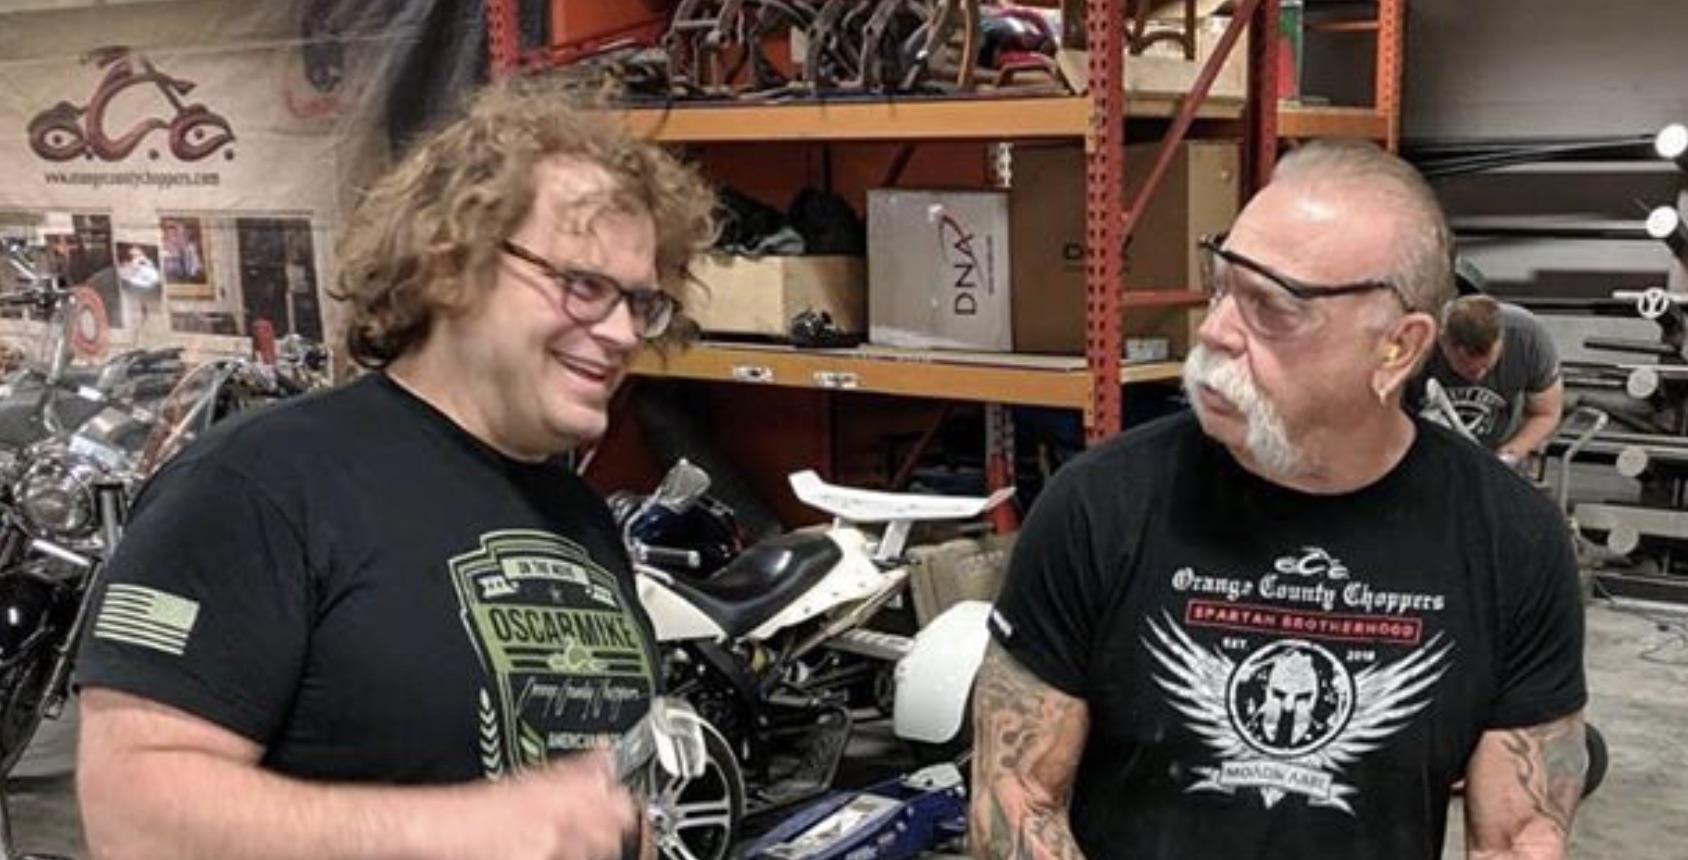 Mike Teutul, Paul Teutul Sr, American Chopper-https://www.instagram.com/p/Bxh98UAhEAL/